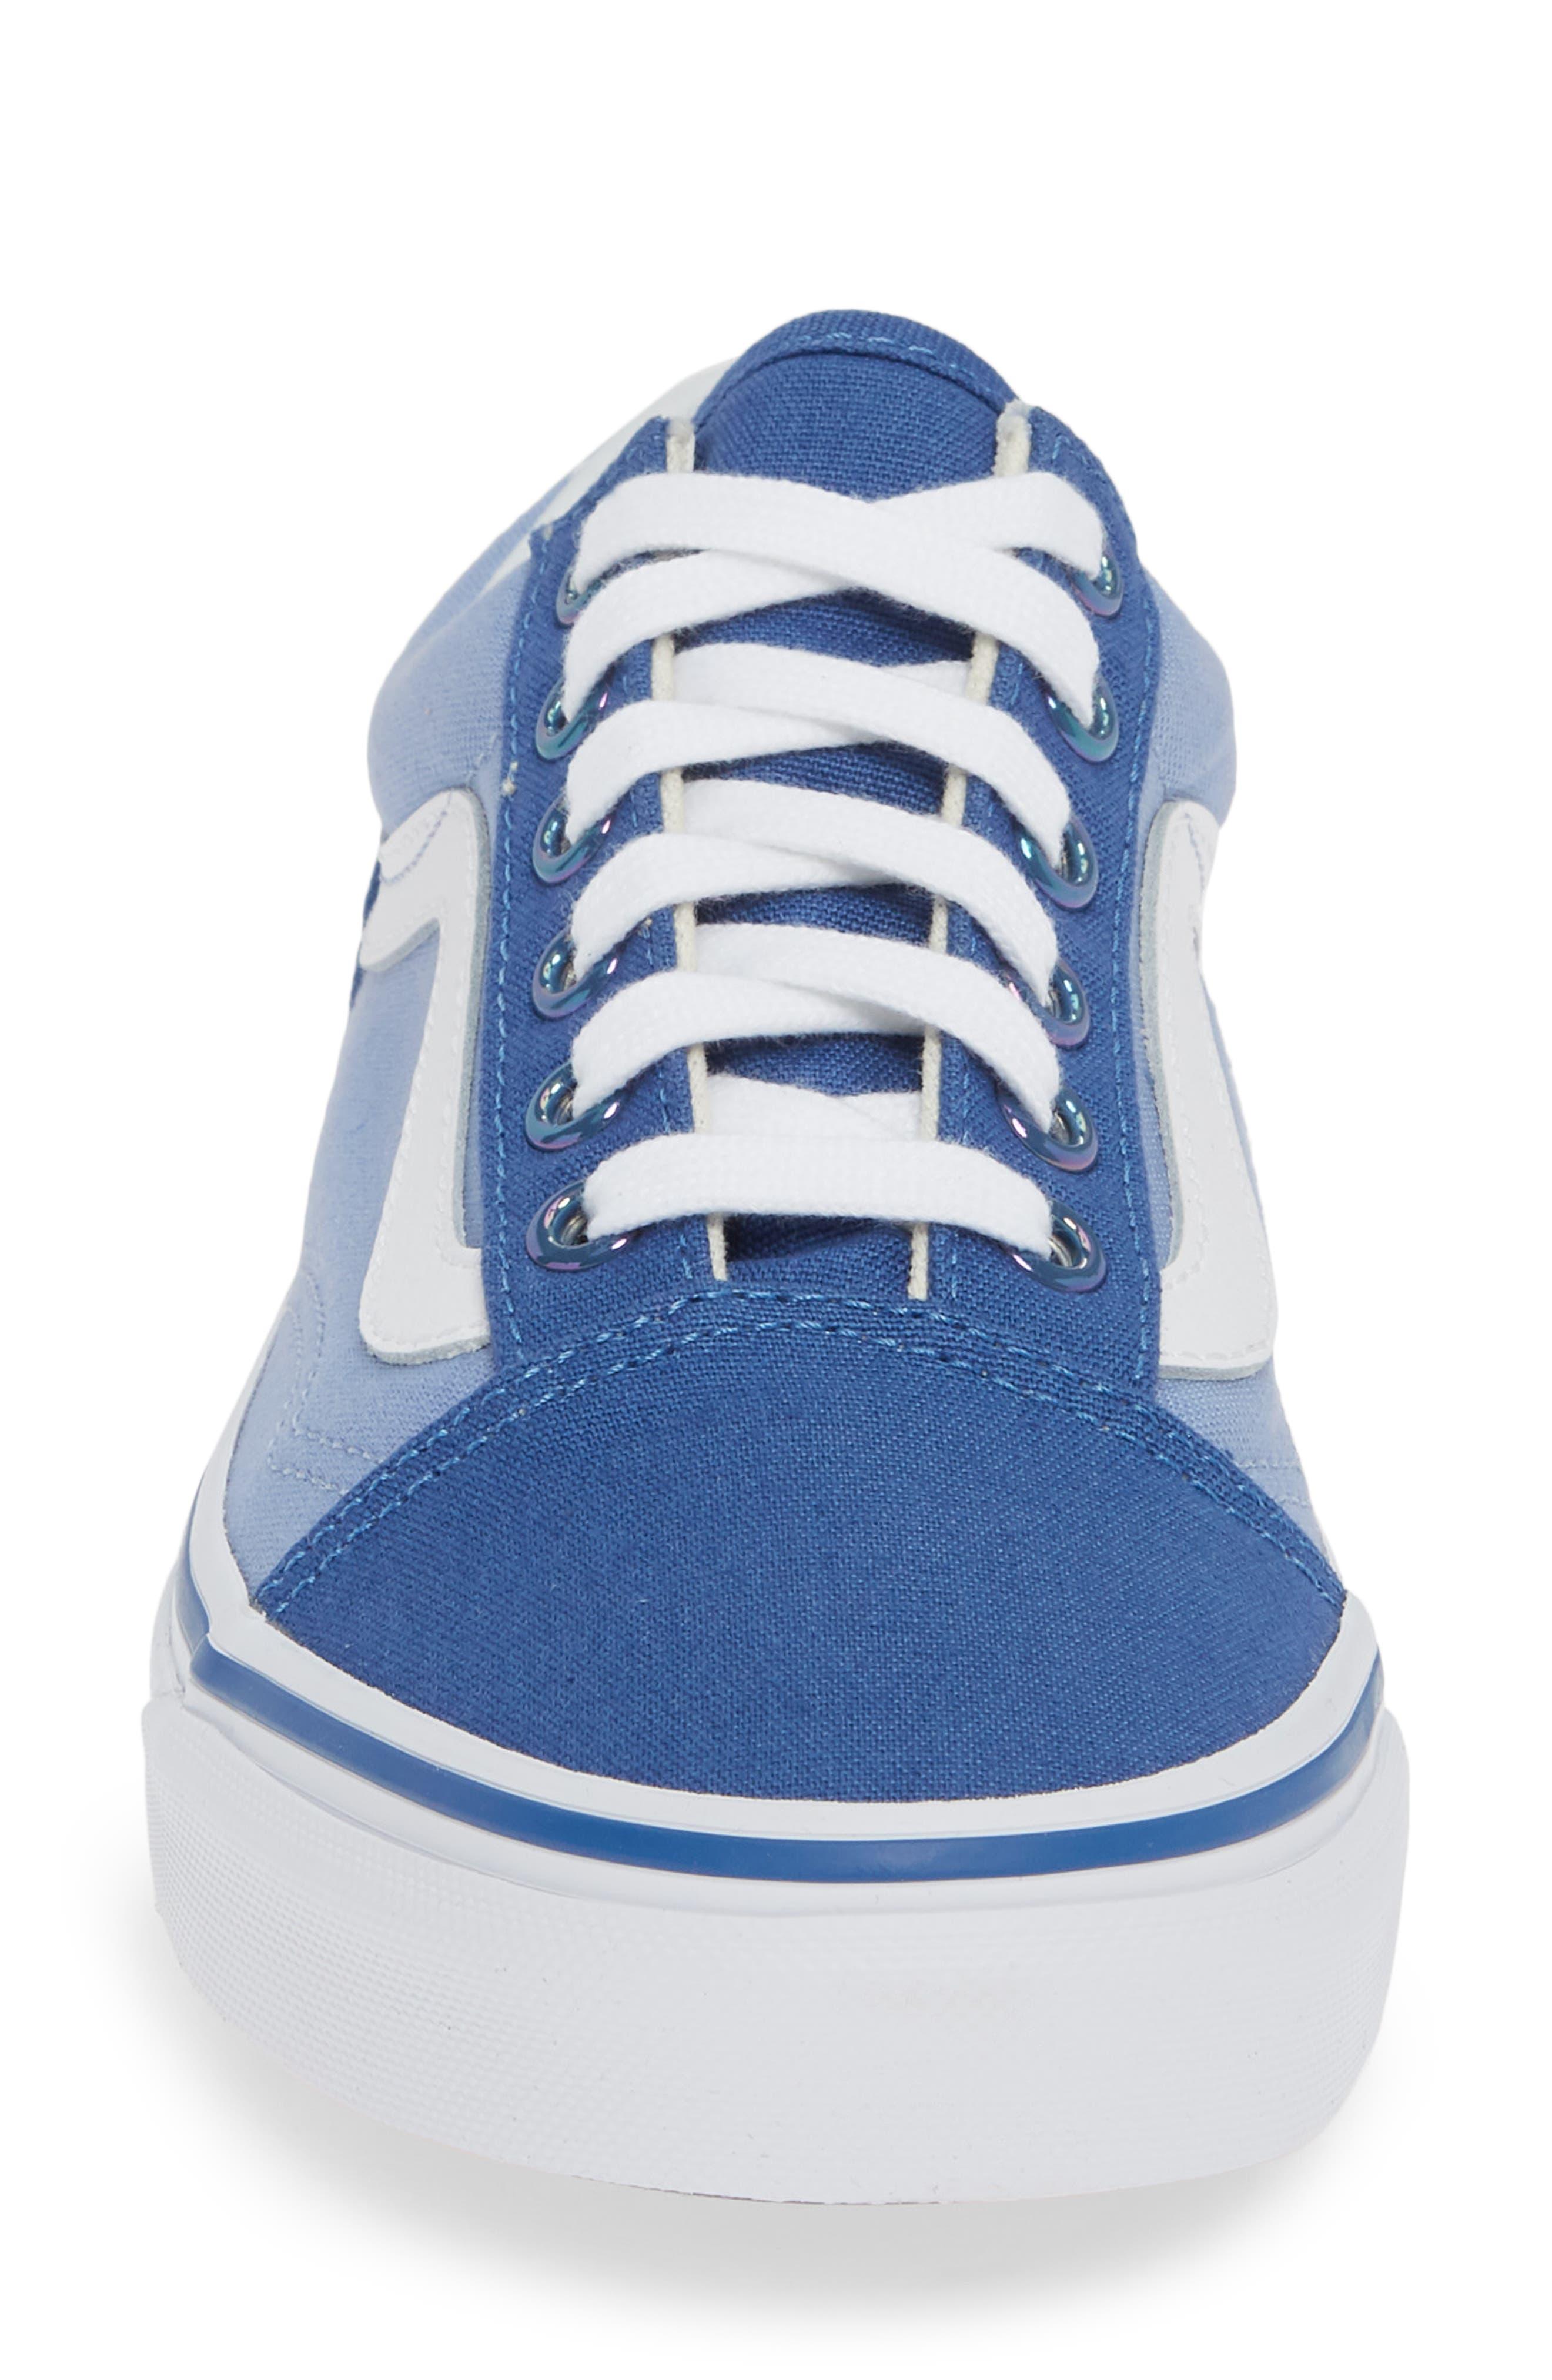 Old Skool Sneaker,                             Alternate thumbnail 4, color,                             FEDERAL BLUE/ LAVENDER LUSTER